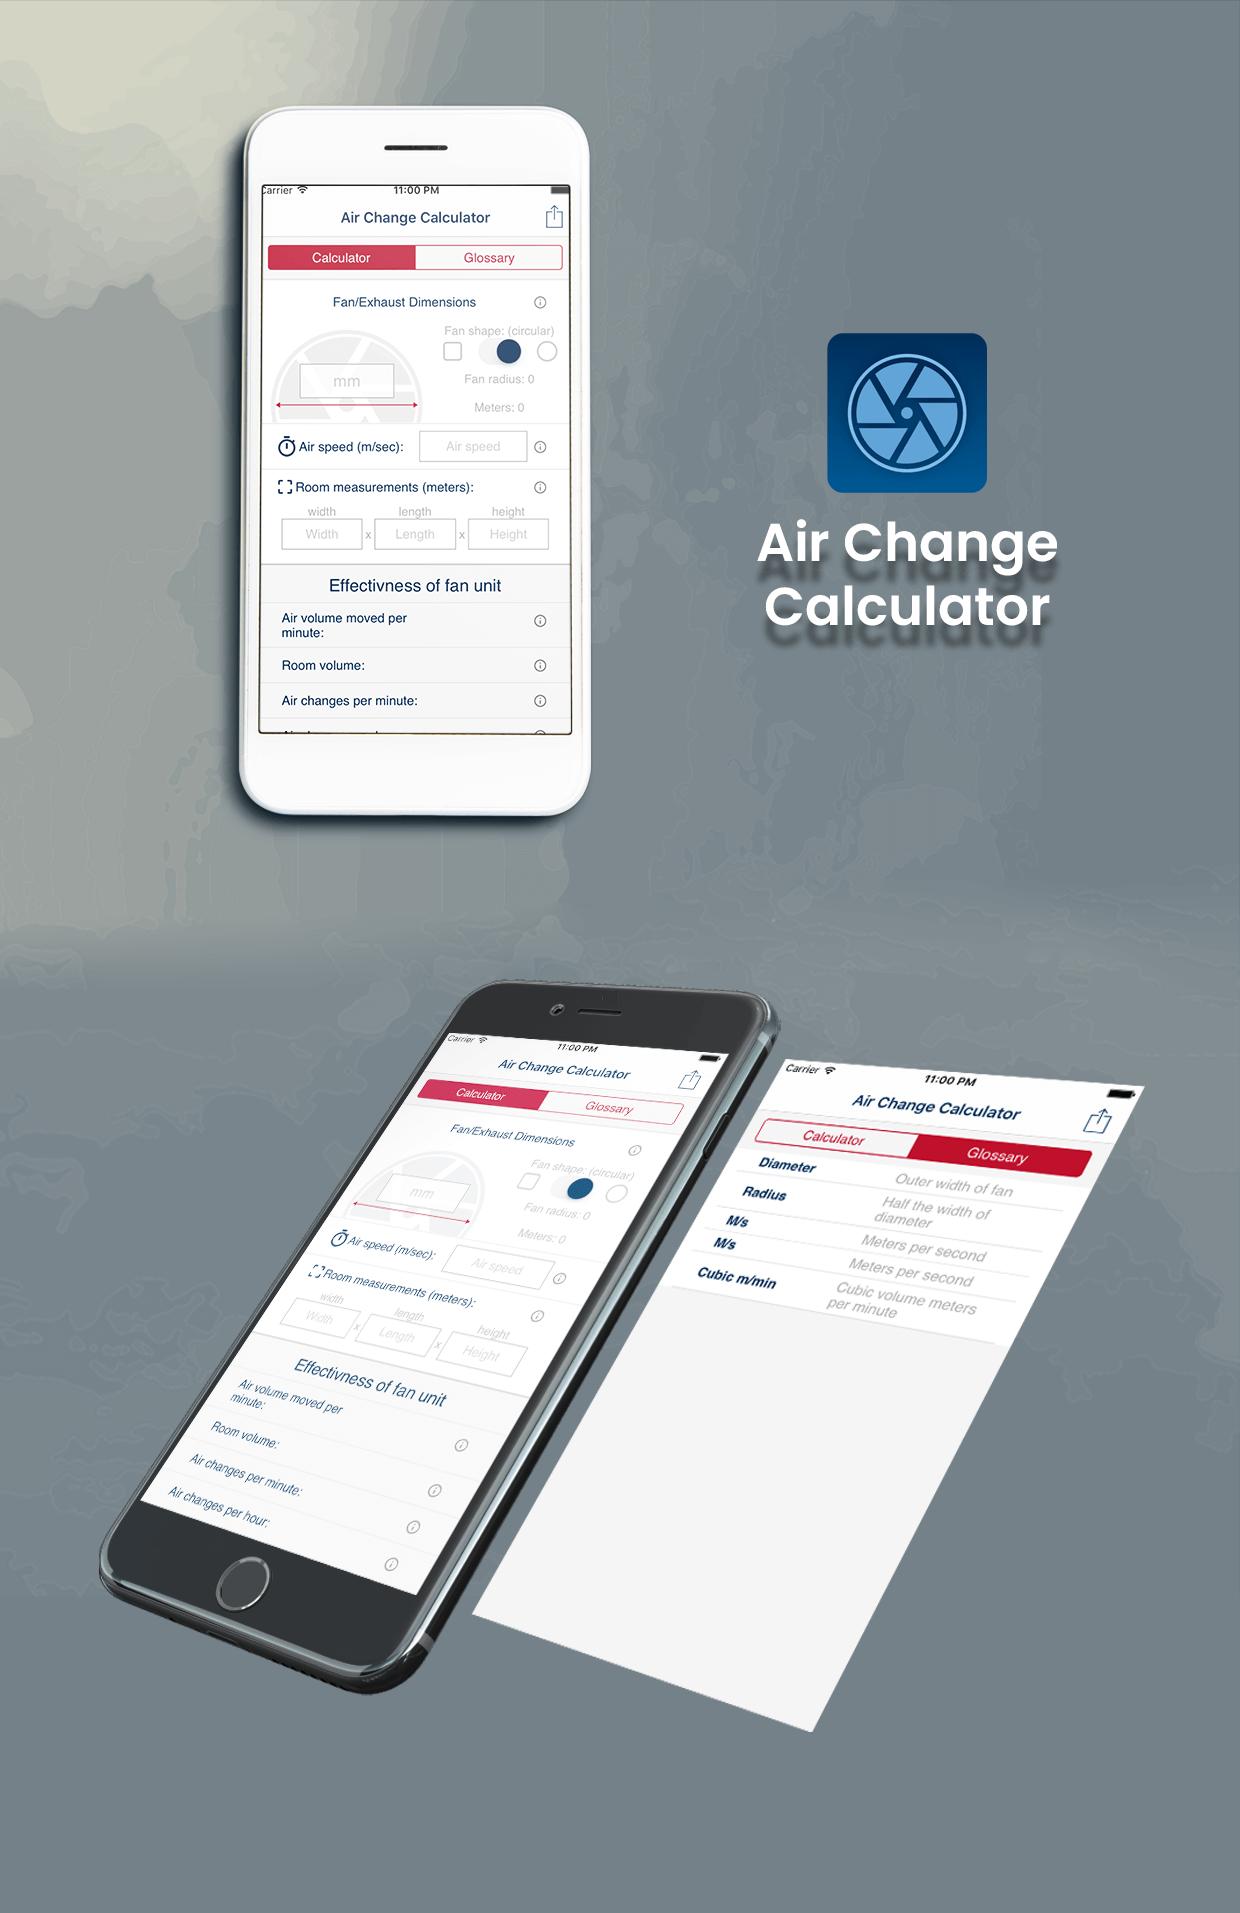 Air Change Calculator